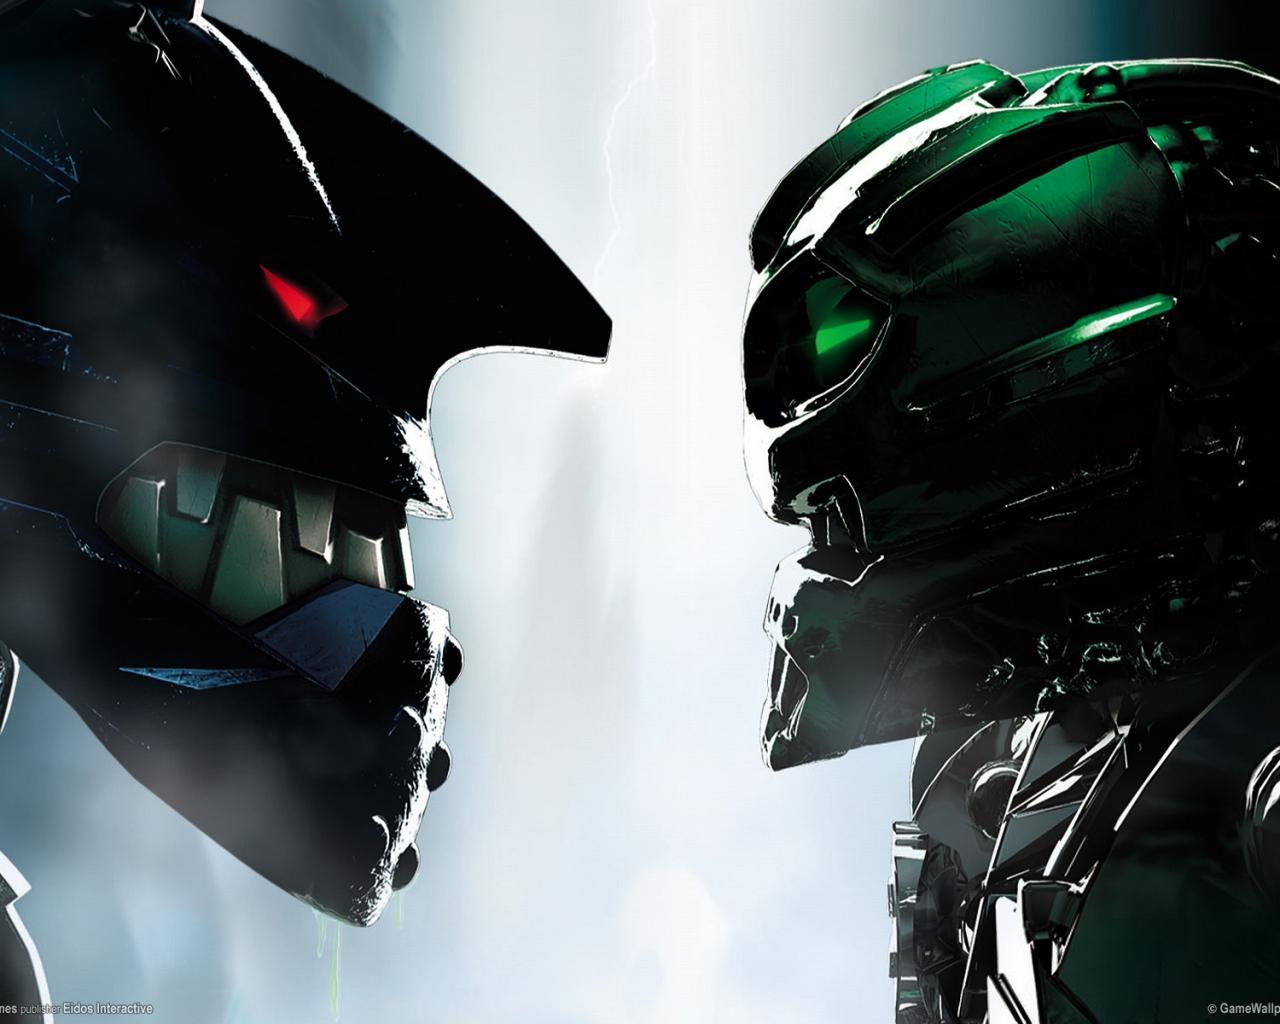 Обои игры игра Games Pubg Playerunknowns картинки на: Bionicle Heroes, Game, Pc Games, игра, видео игры